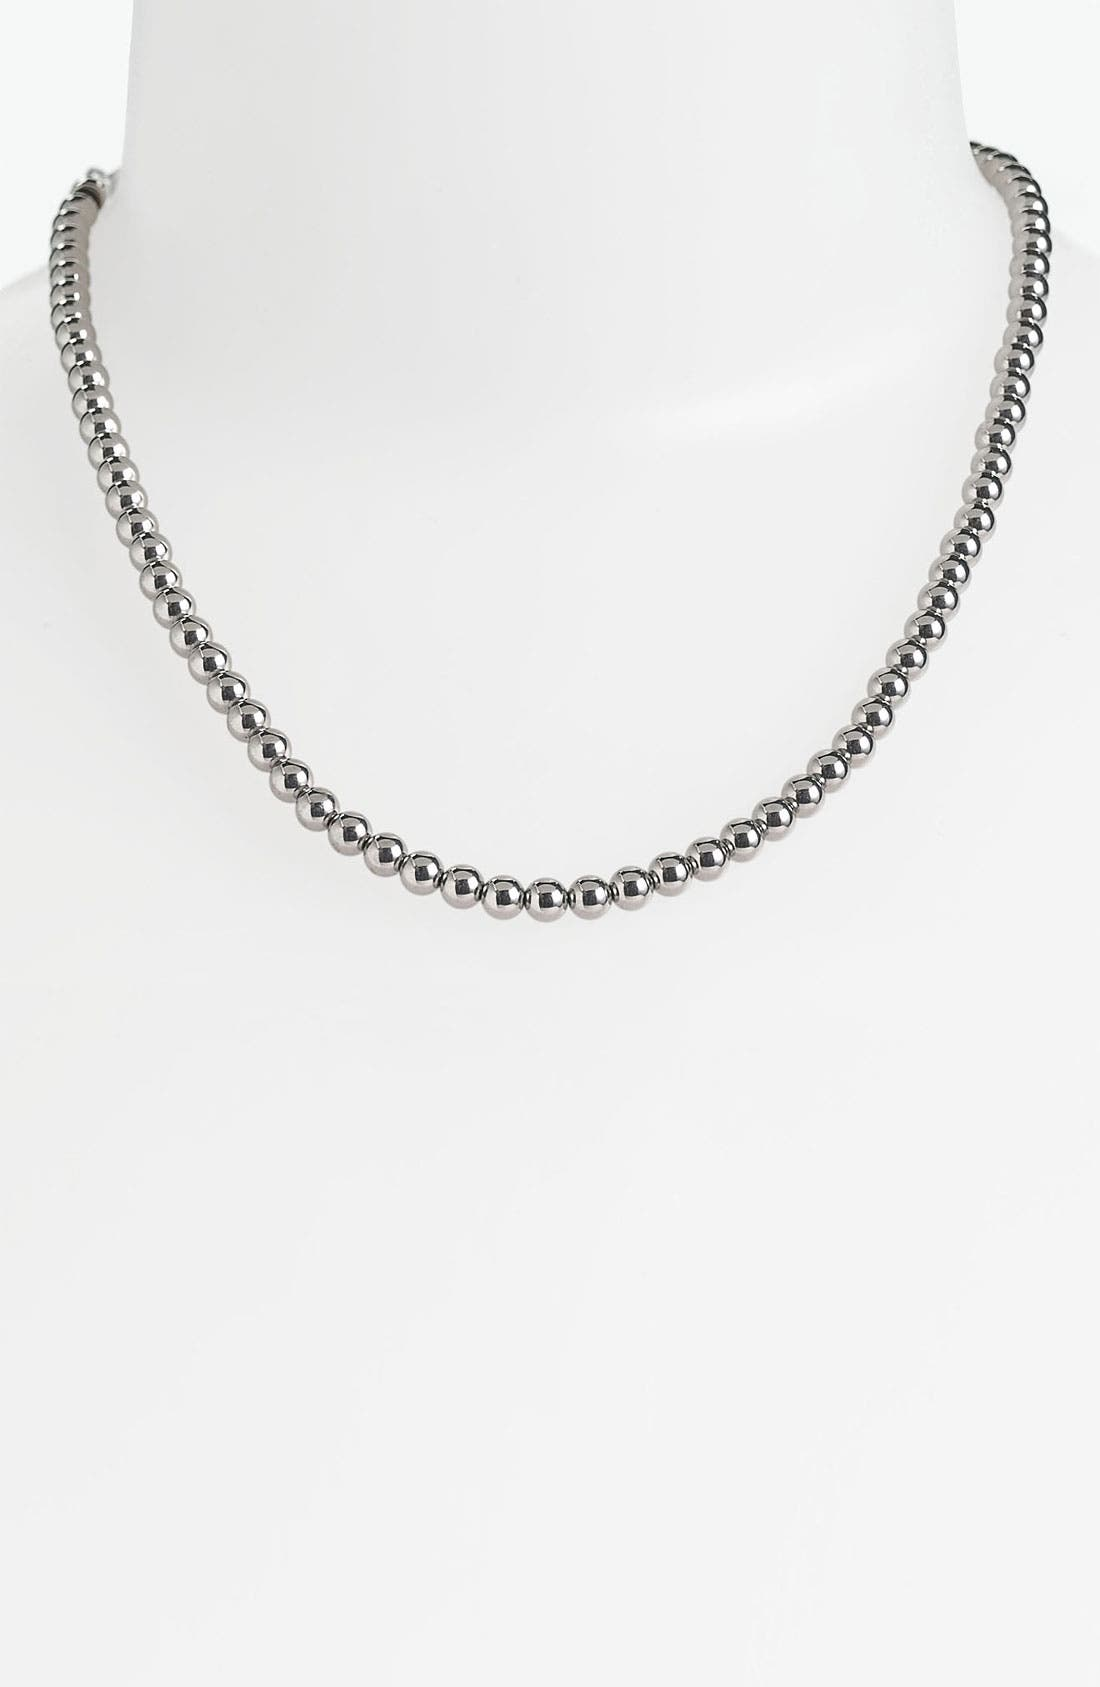 Main Image - Michael Kors 'Classics' Beaded Necklace